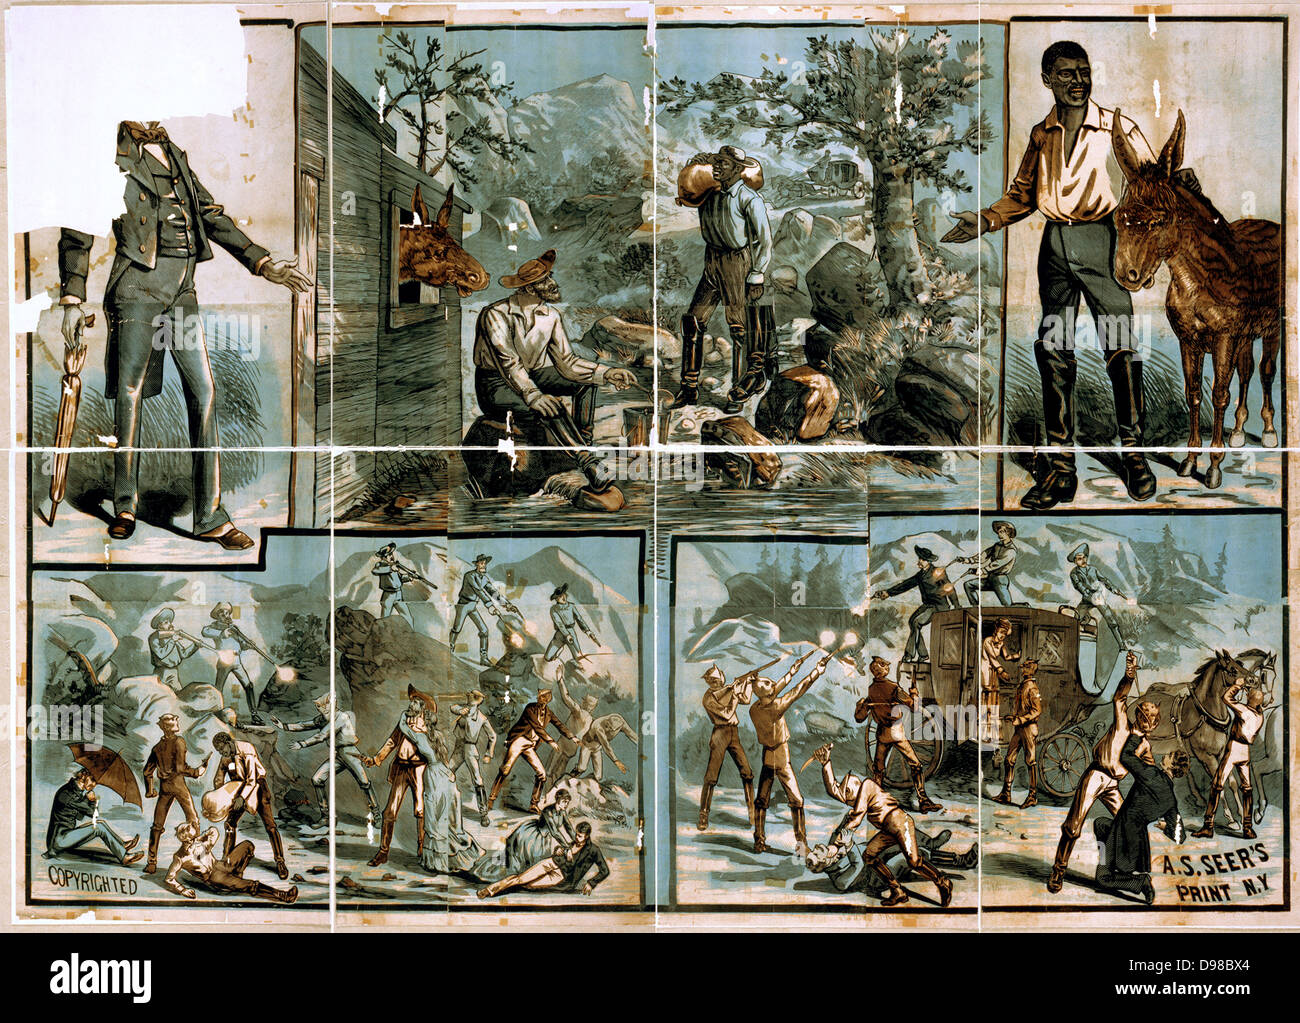 Vignettes of western scenes Creator(s): A.S. Seer., 1881? - Stock Image